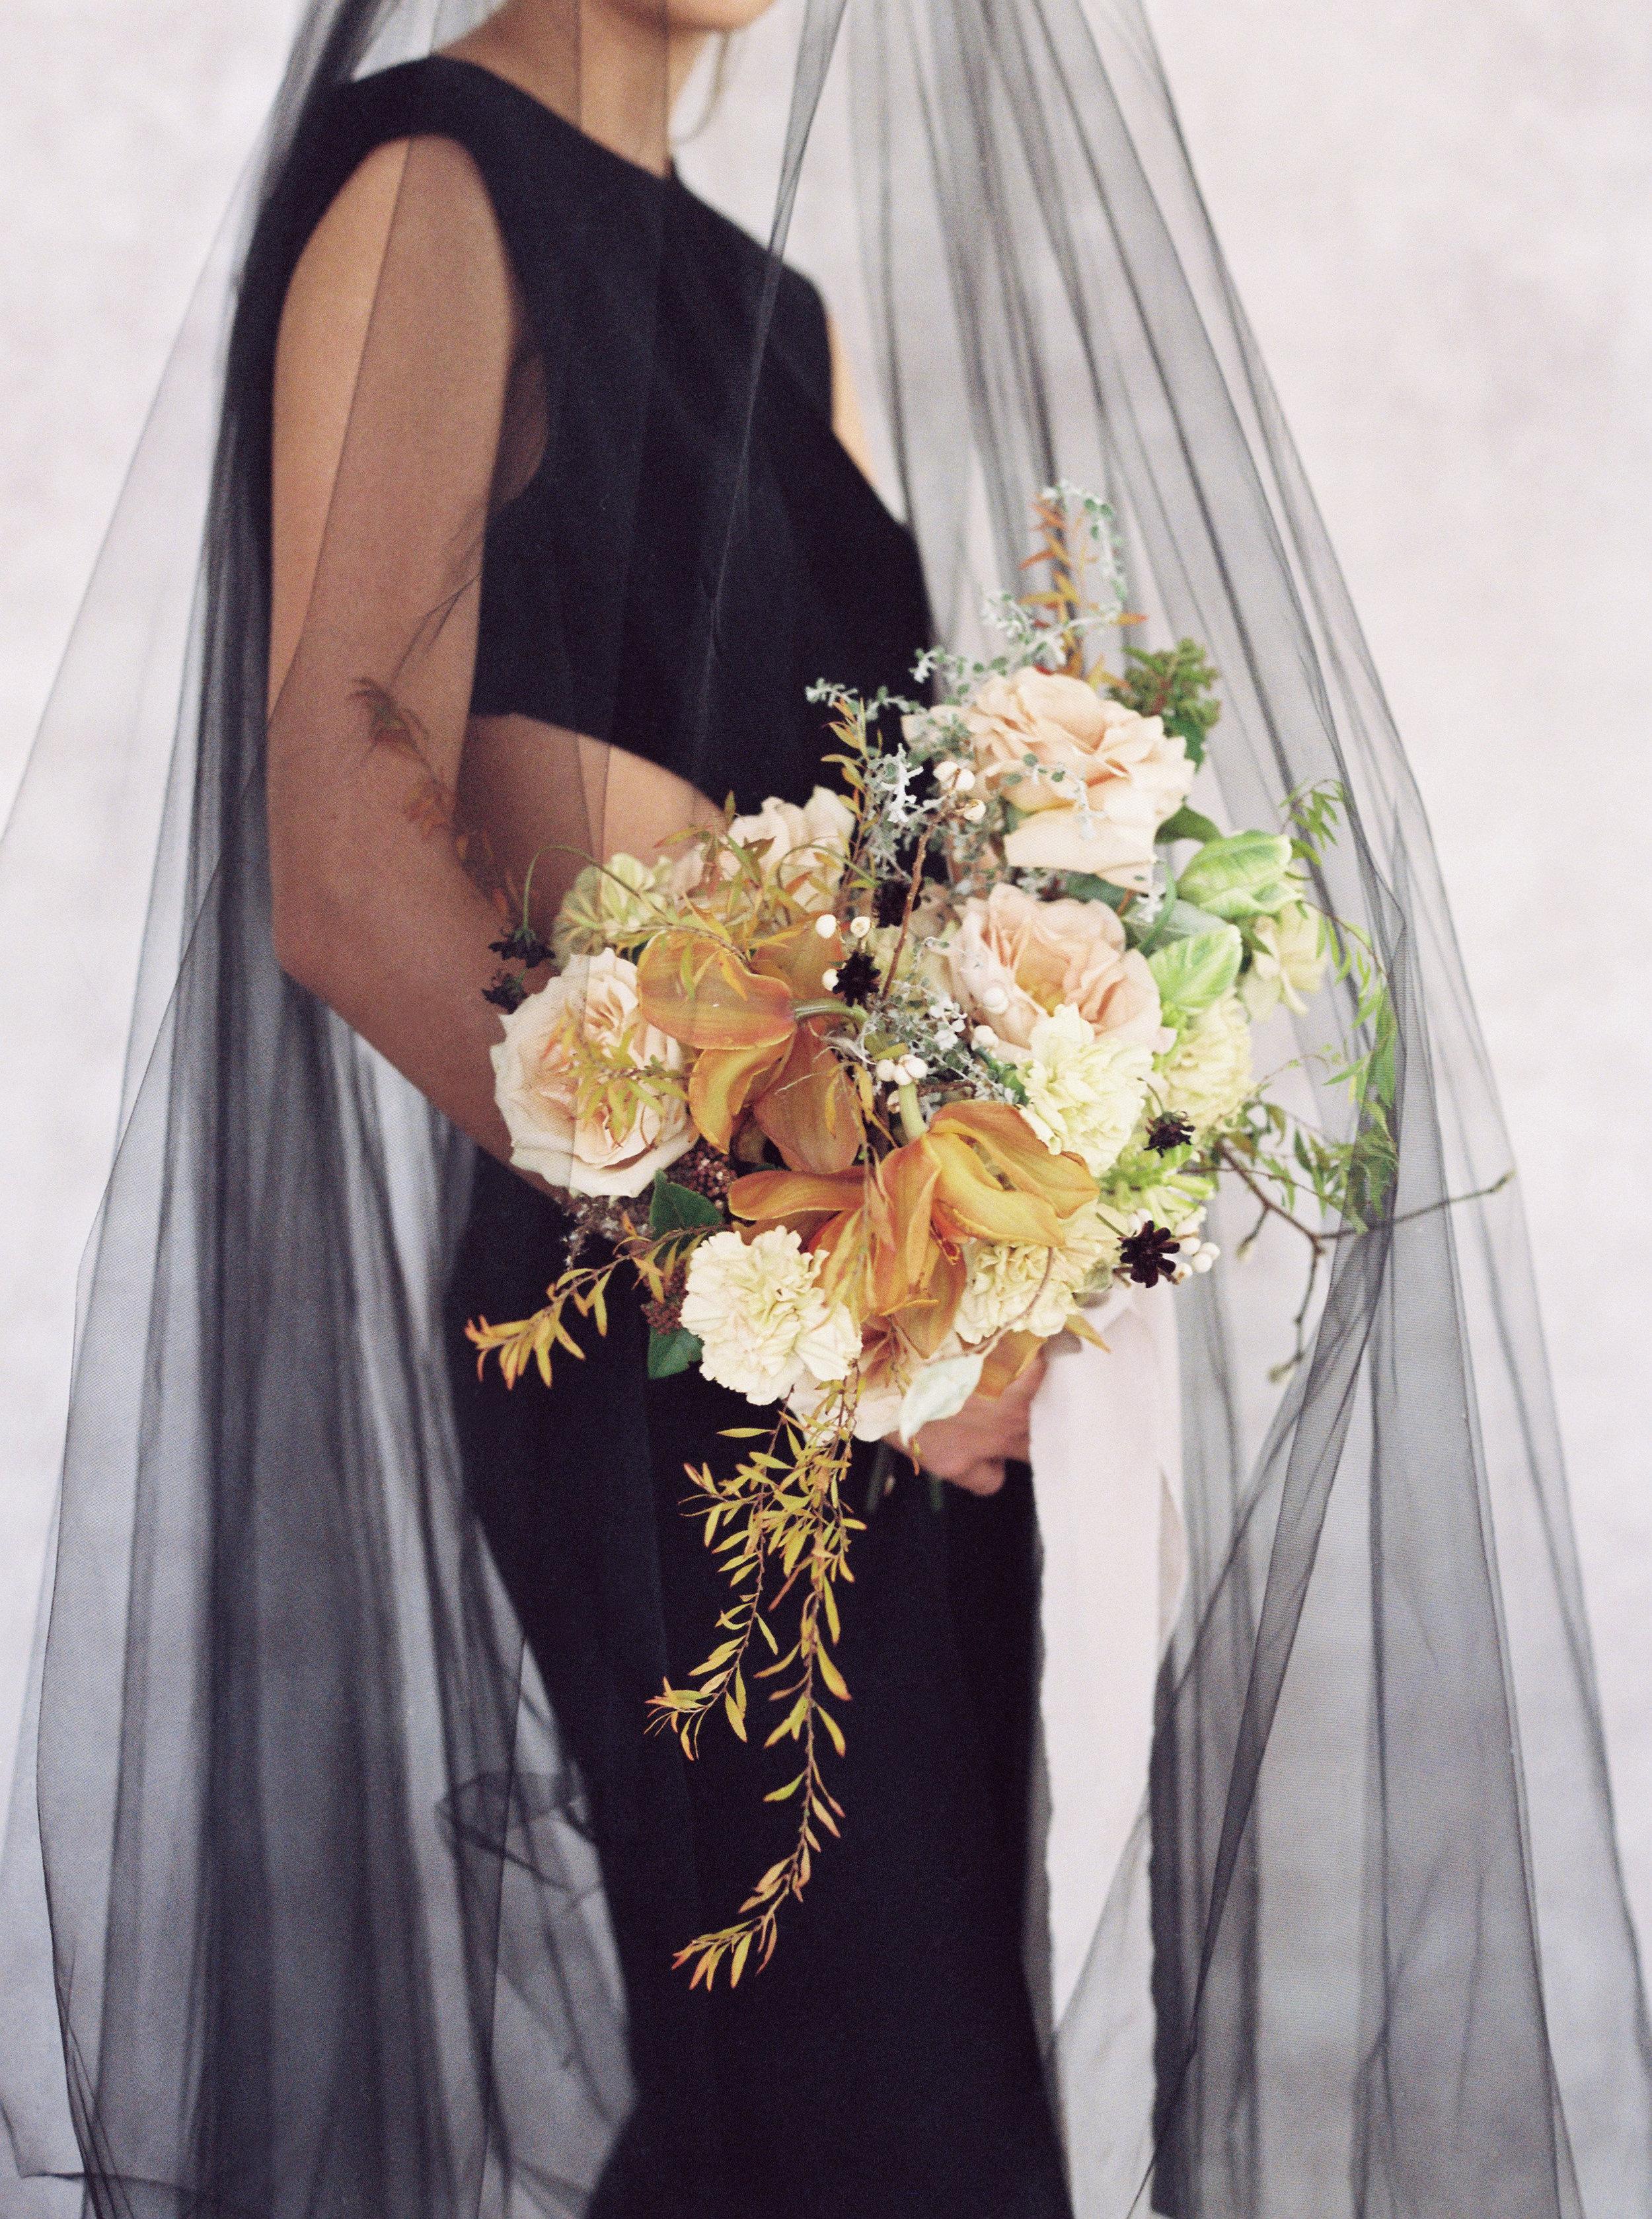 Kyle John l Fine Art Wedding Photography l Chicago, Copenhagen, California, New York, Destination l Blog l Caroline_Studio_38